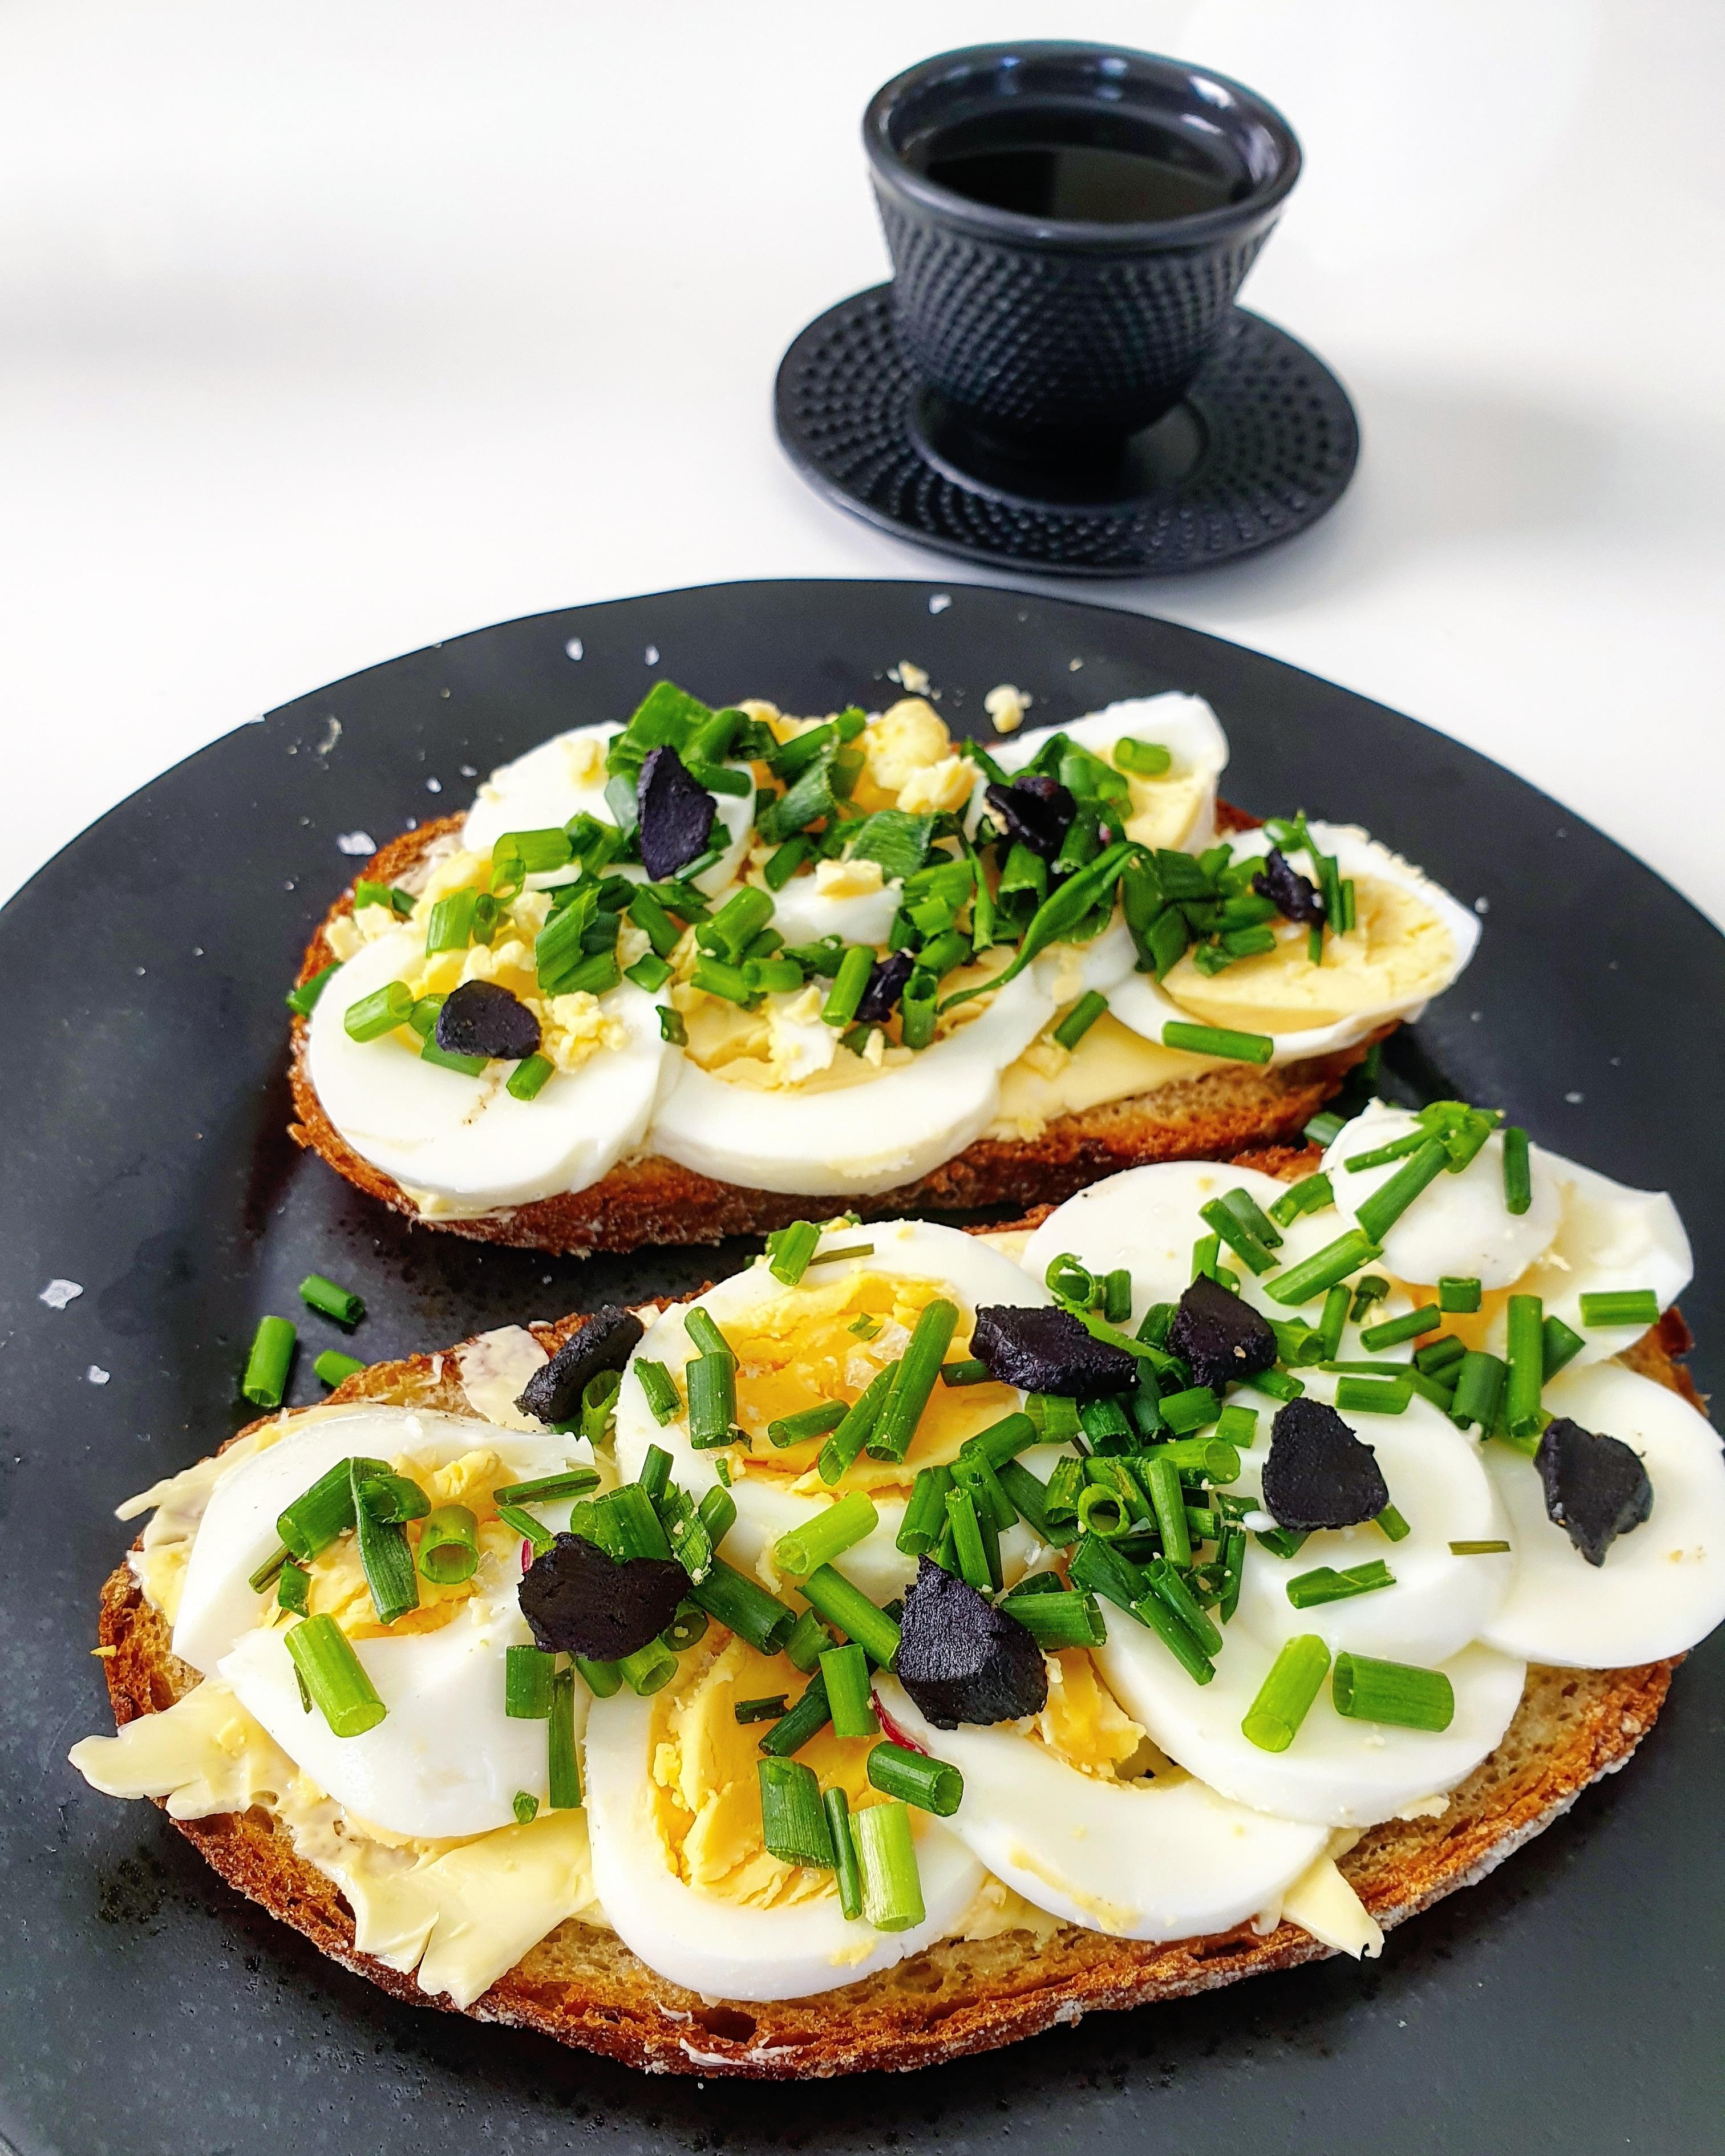 Kváskový chléb s vajíčky a černým česnekem